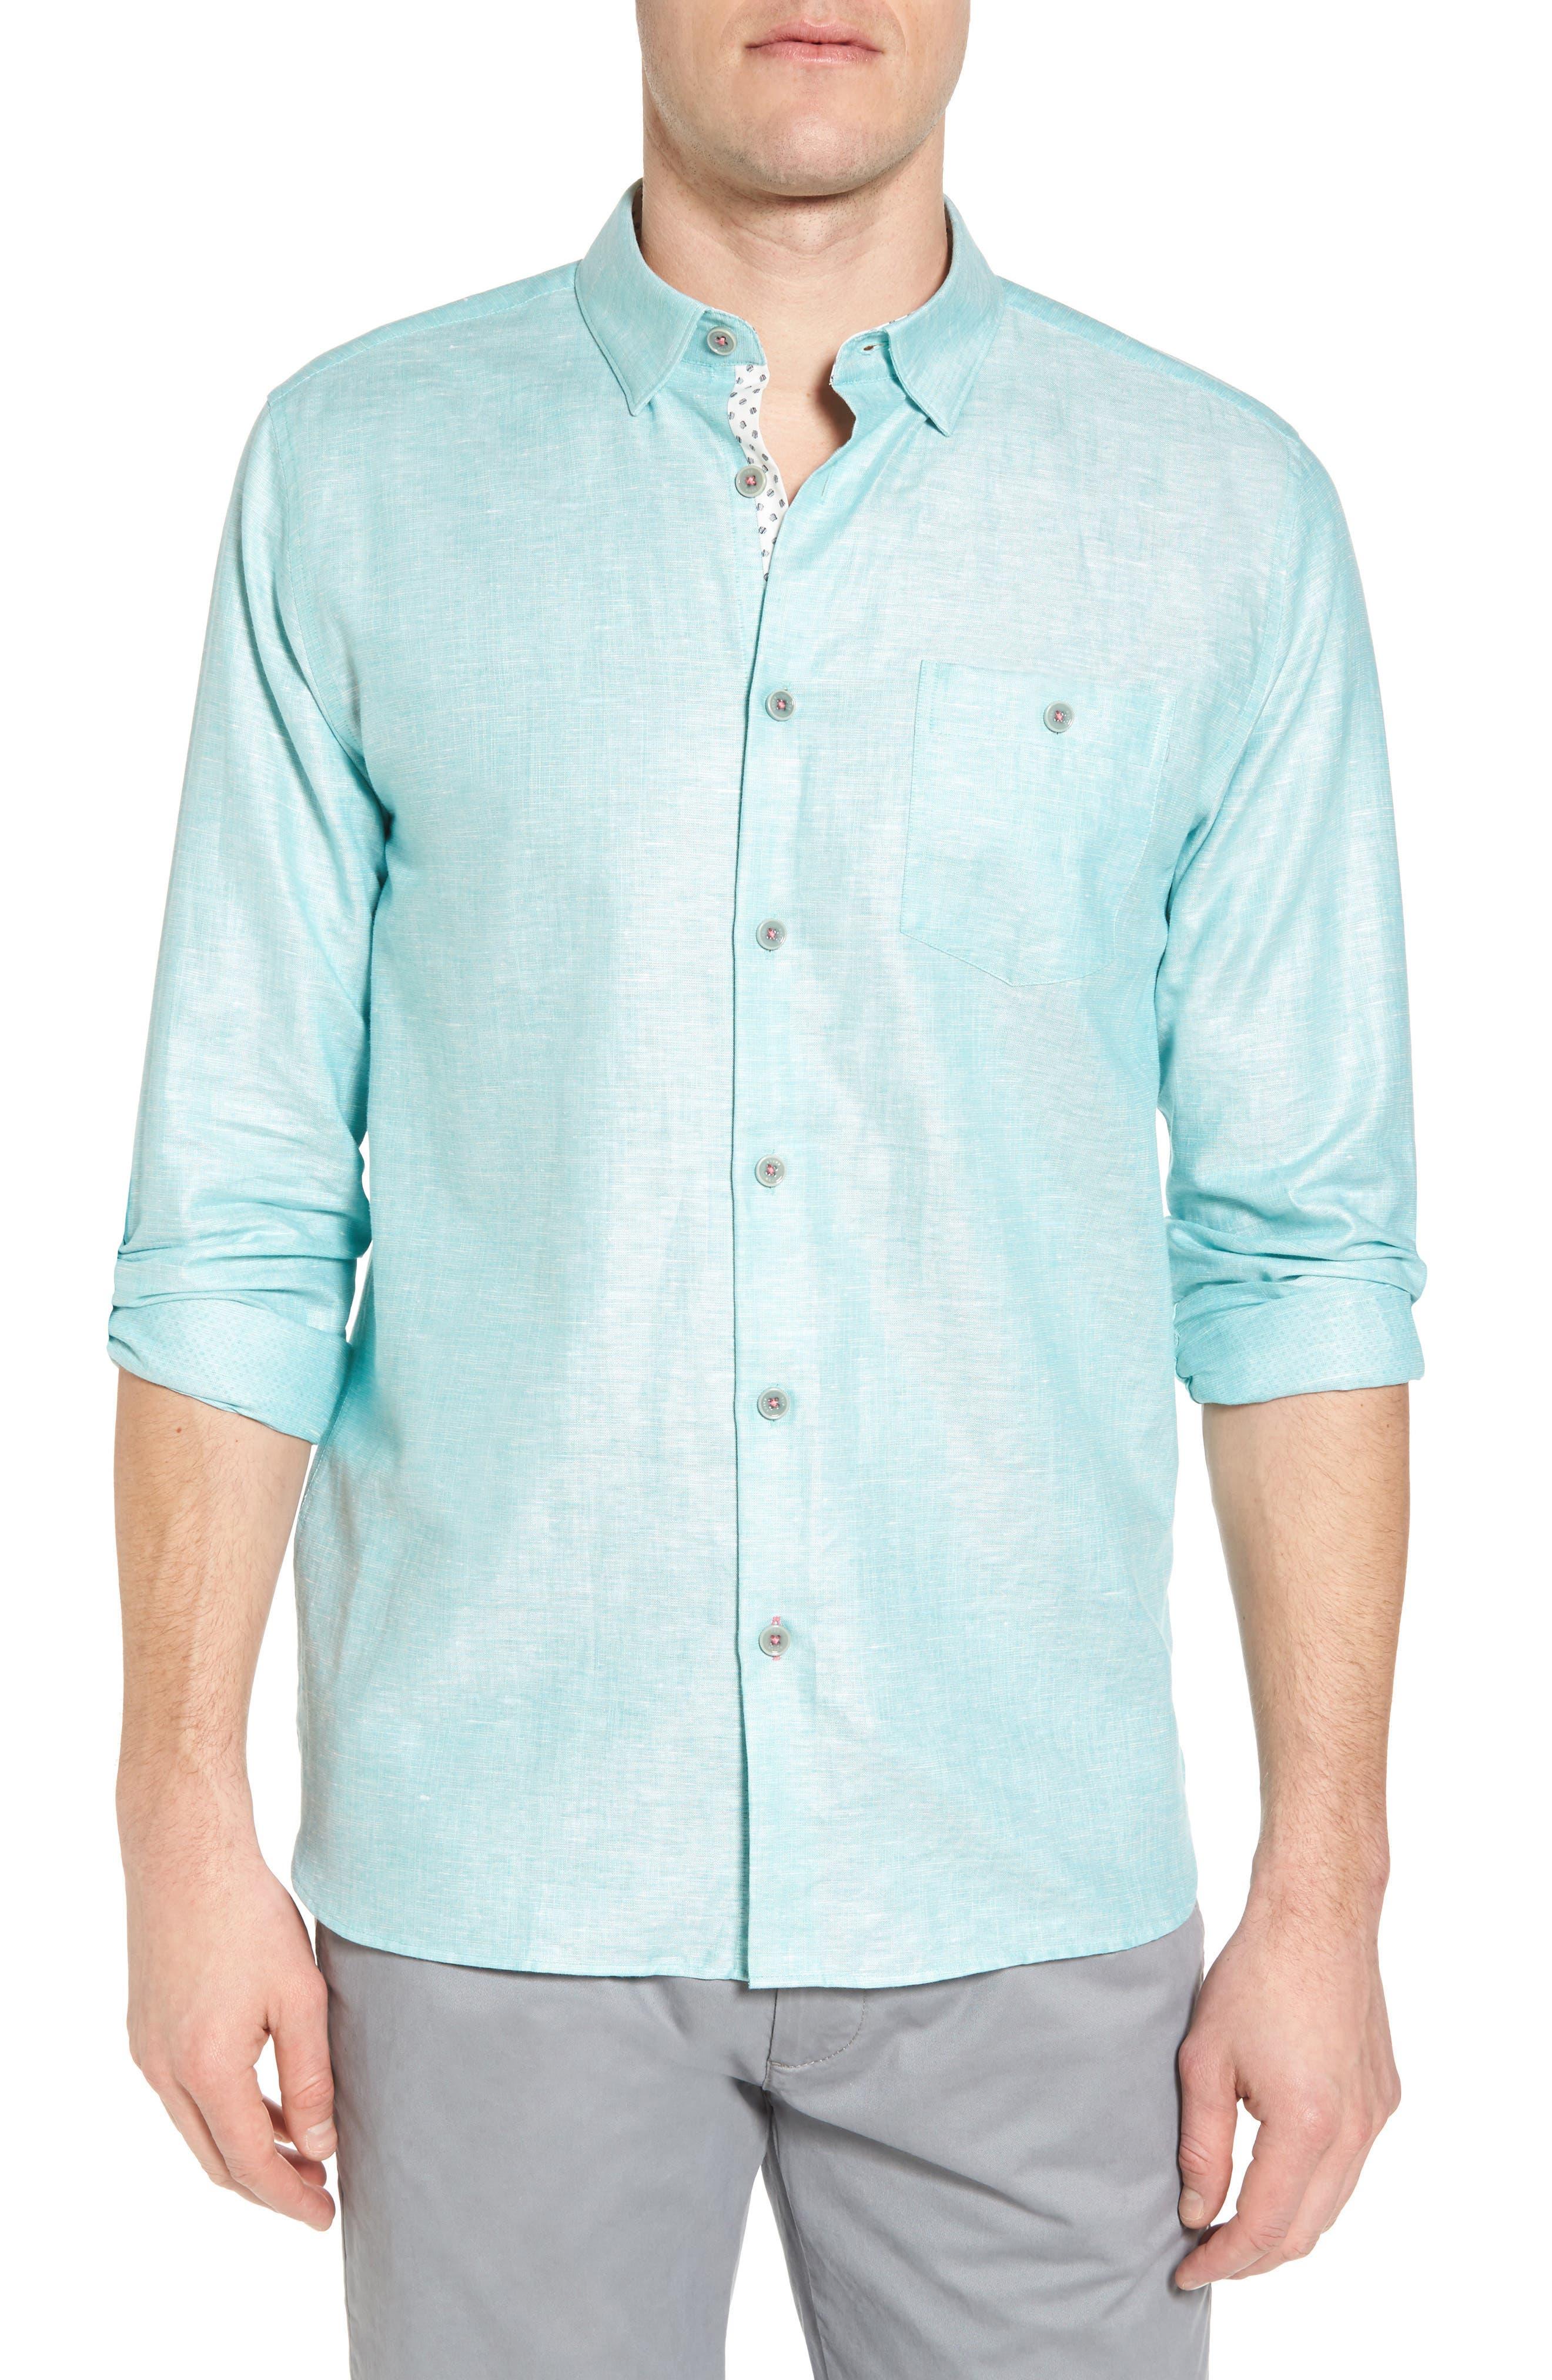 Linlins Herringbone Cotton & Linen Sport Shirt,                             Main thumbnail 1, color,                             Green